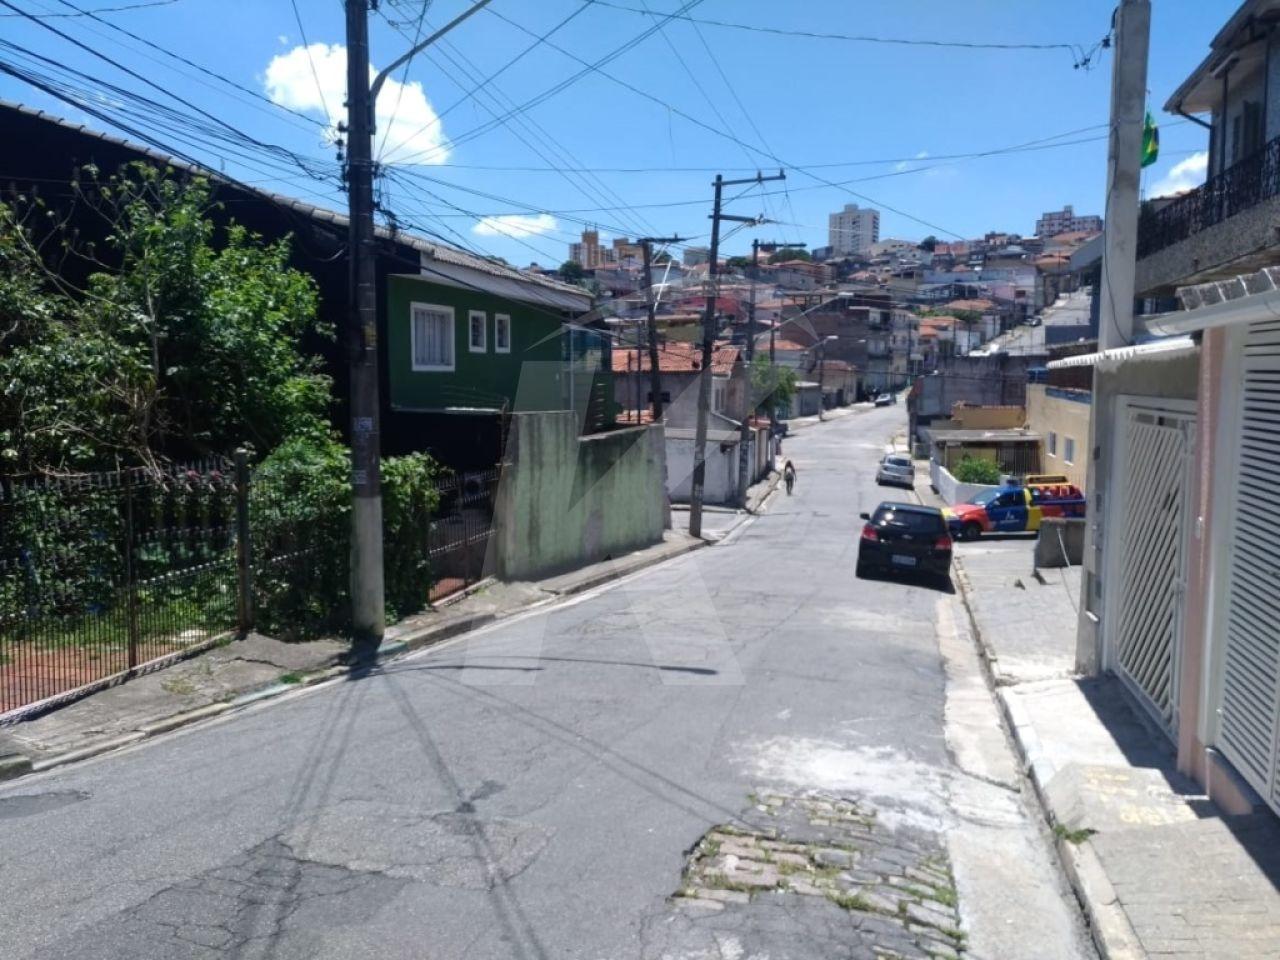 Terreno Vila Medeiros -  Dormitório(s) - São Paulo - SP - REF. KA7507